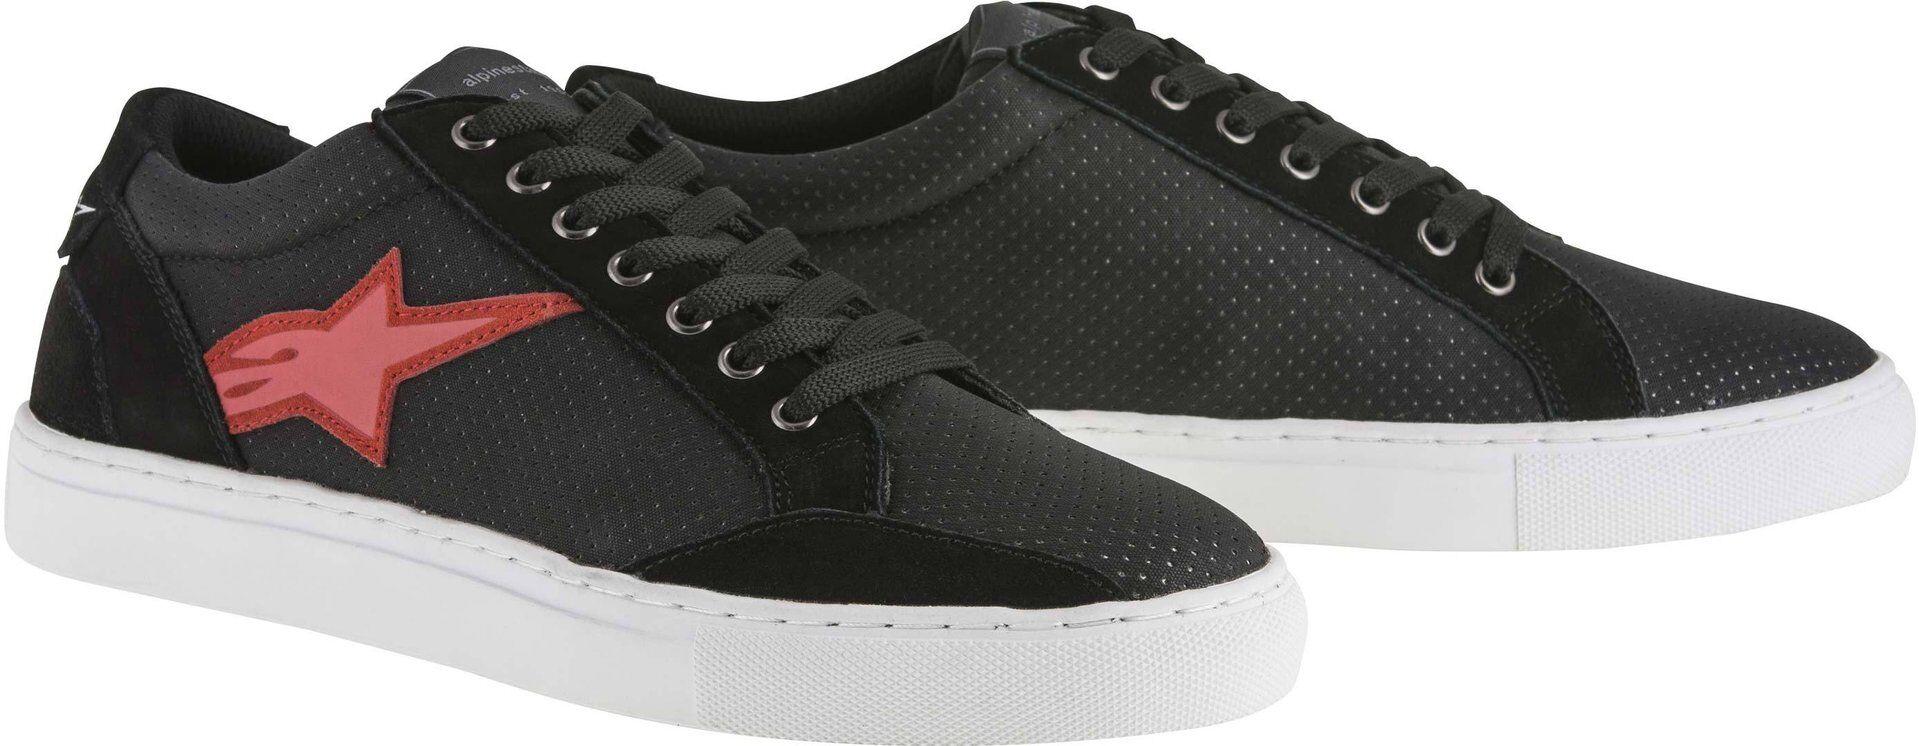 Alpinestars Ace Heritage Shoes unisex Black Pink Size: 150 cm